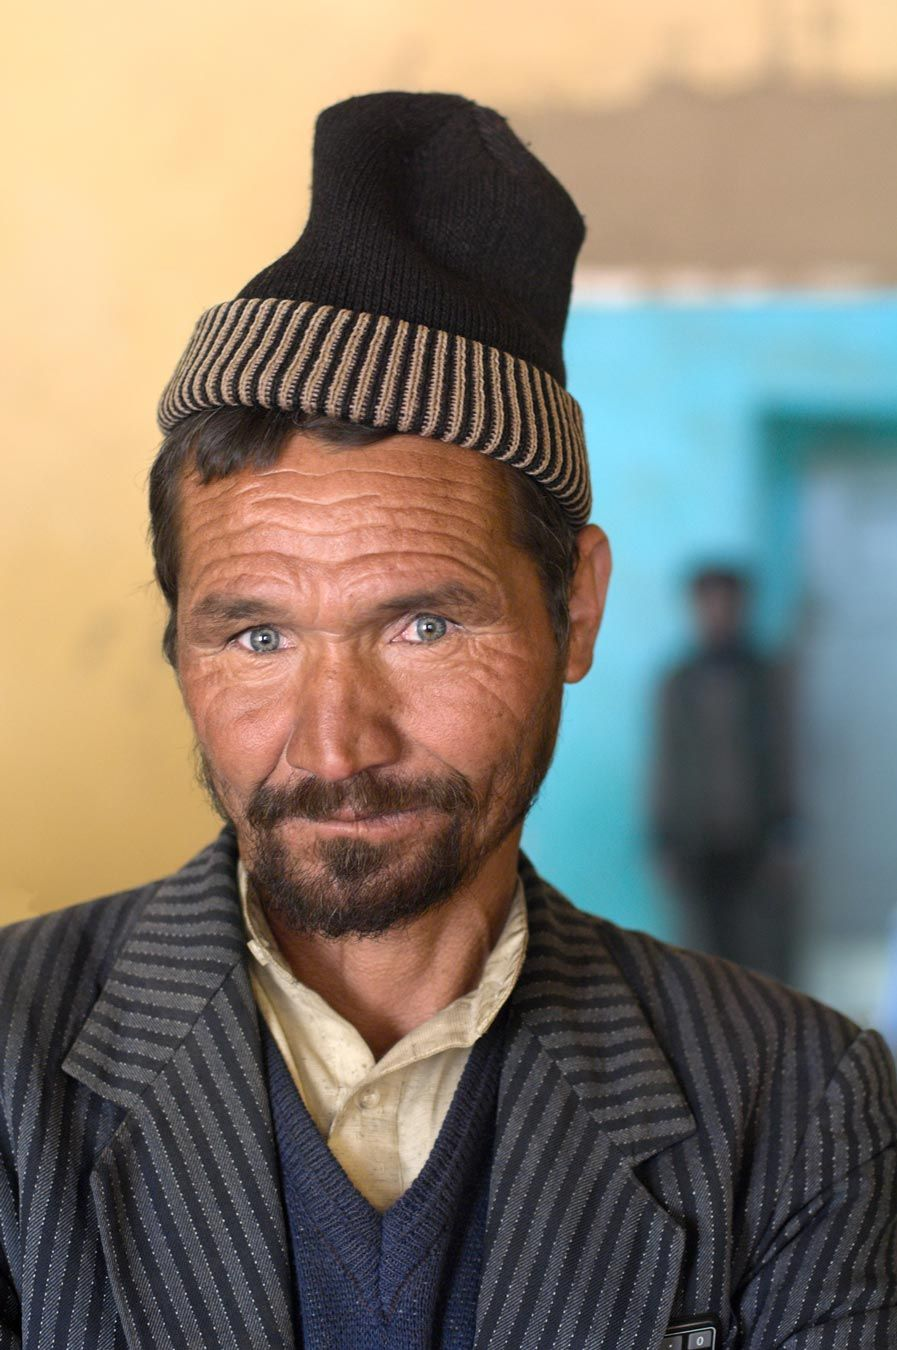 Hazaras | Steve McCurry